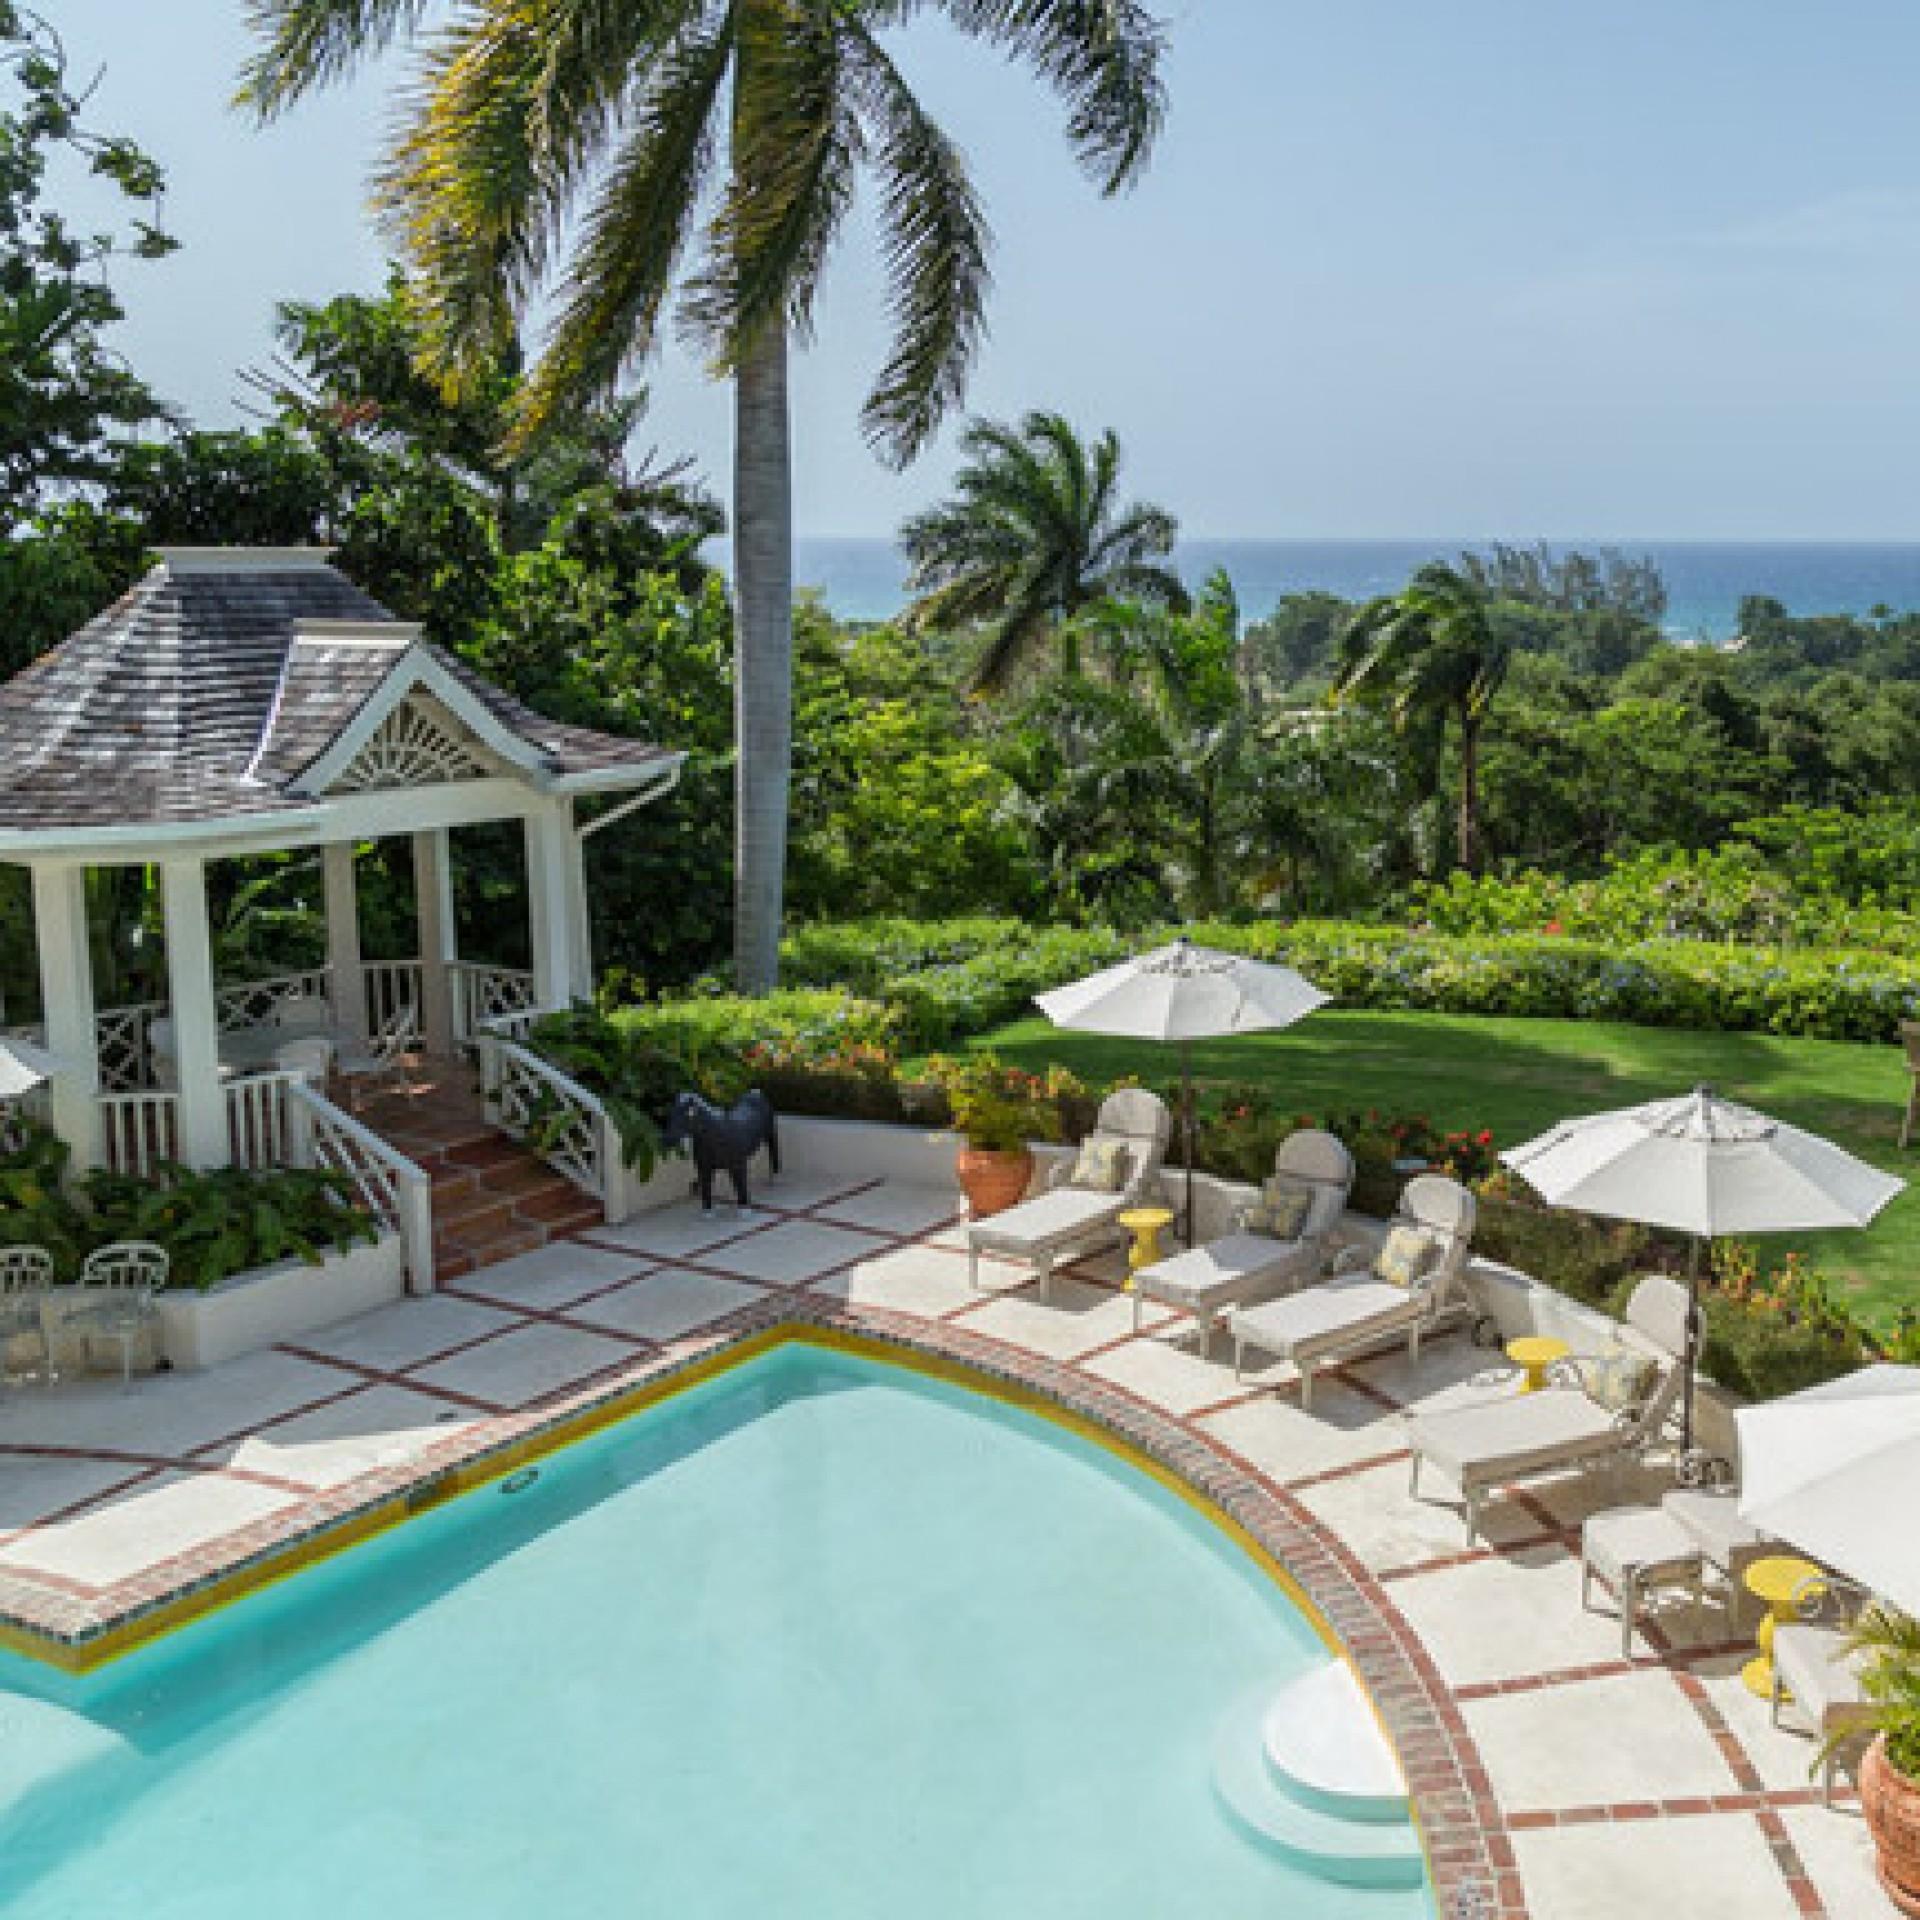 Pineapple house at tryall villa pineapple house at tryall jamaica isle blue - Villa de reve pineapple jamaique ...